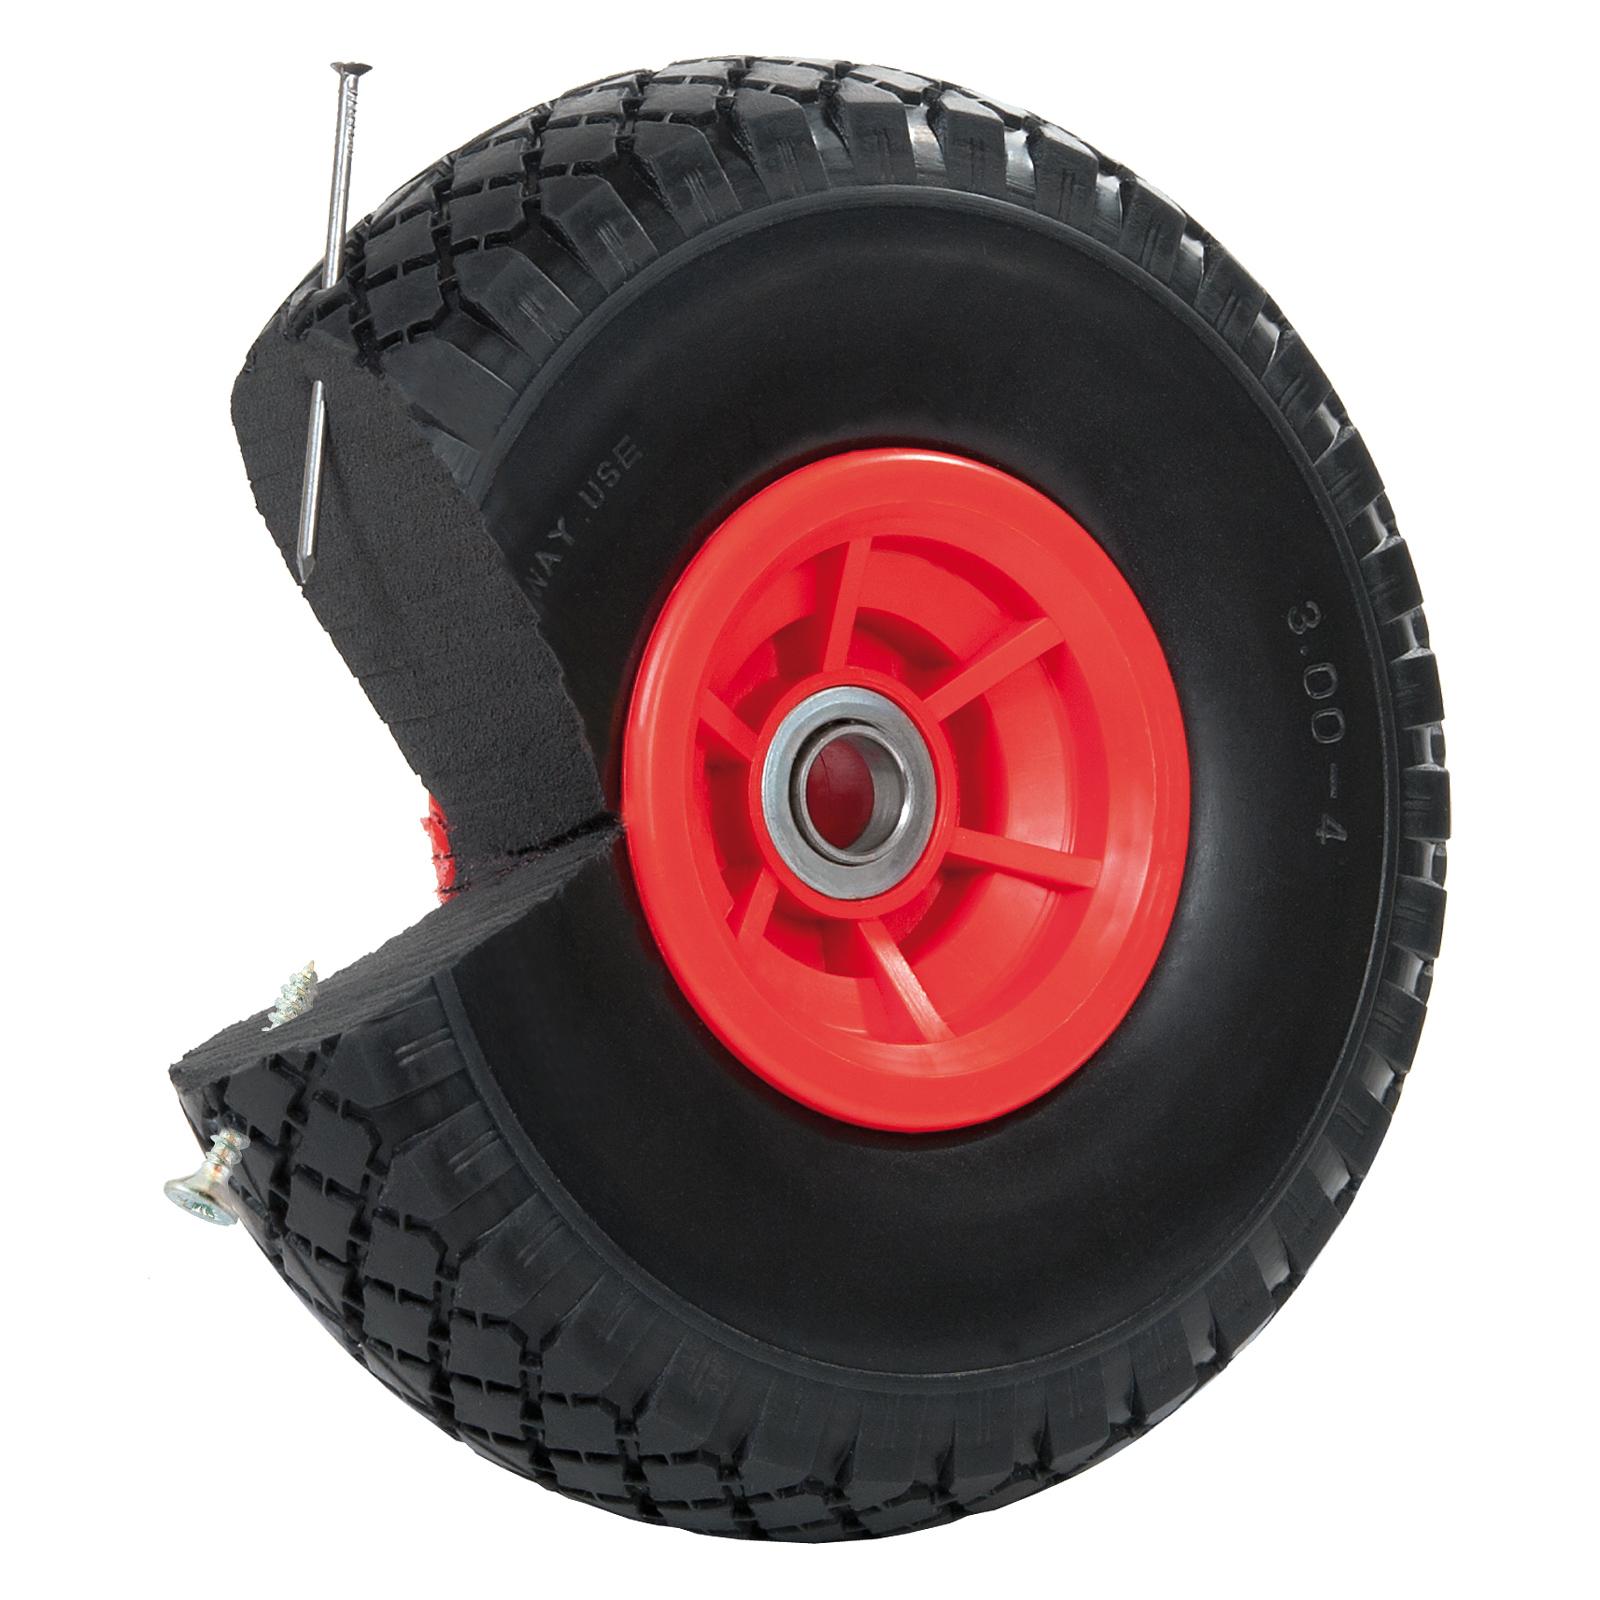 Pro-Bau-Tec PU-Rad für Sackkarre 11840